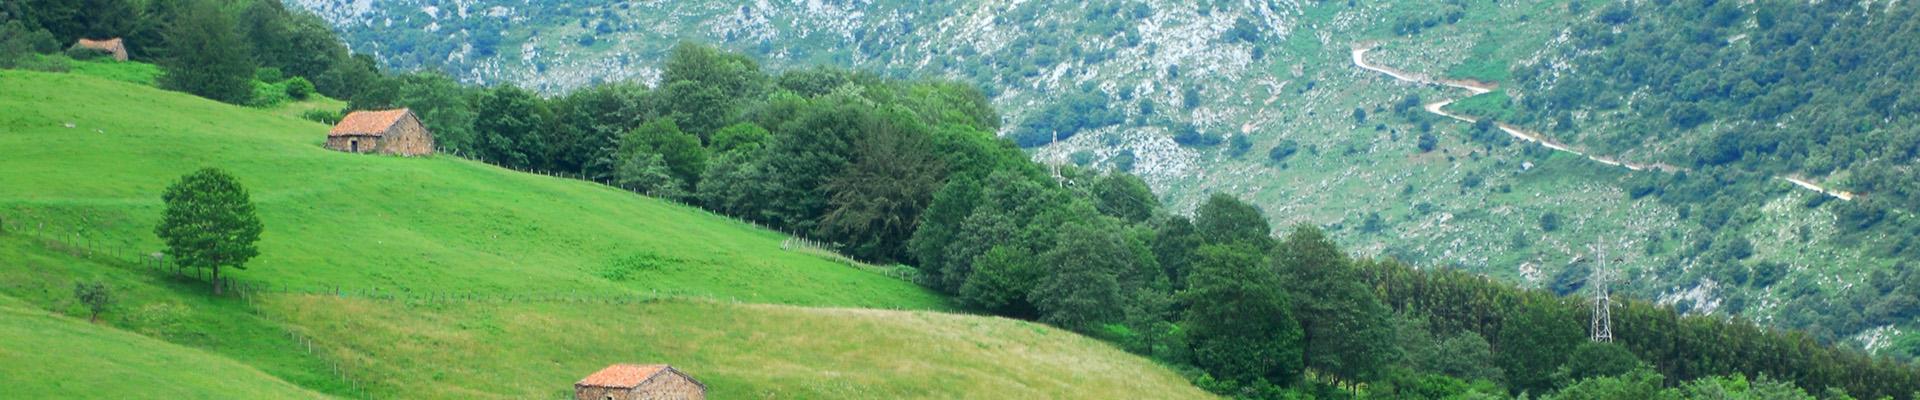 Valle del Nansa org Cantabria Spain